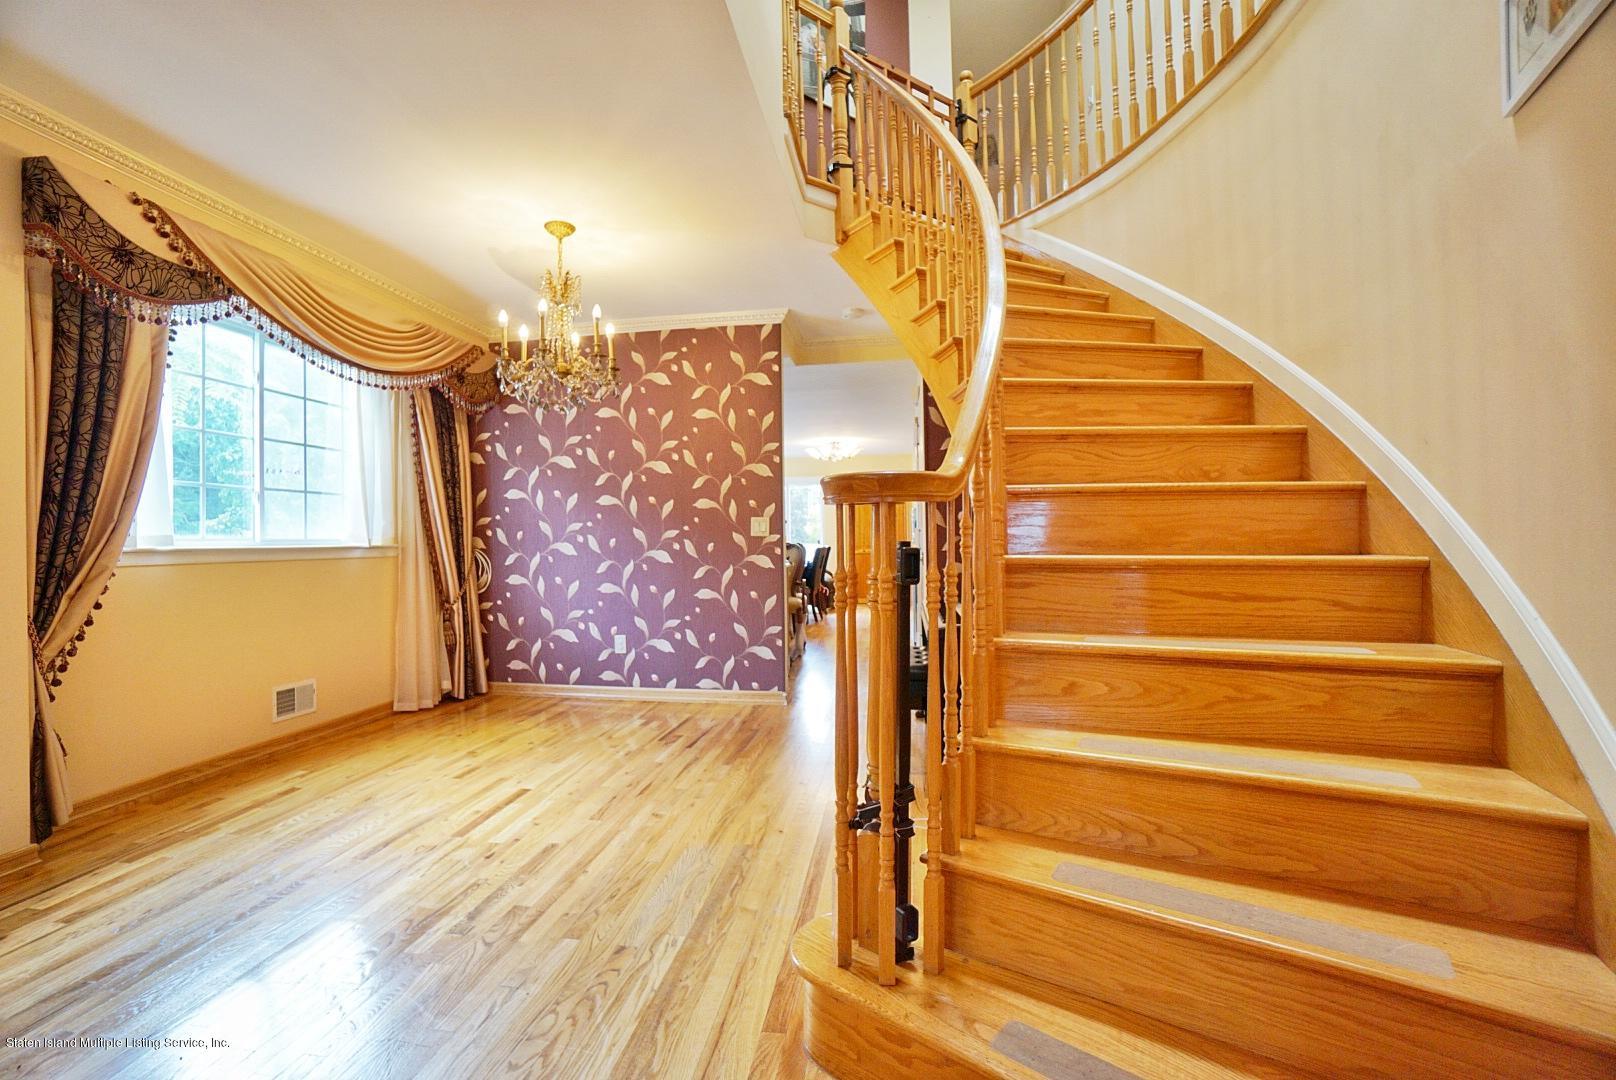 Single Family - Semi-Attached 36 Zwicky Avenue  Staten Island, NY 10306, MLS-1131911-9